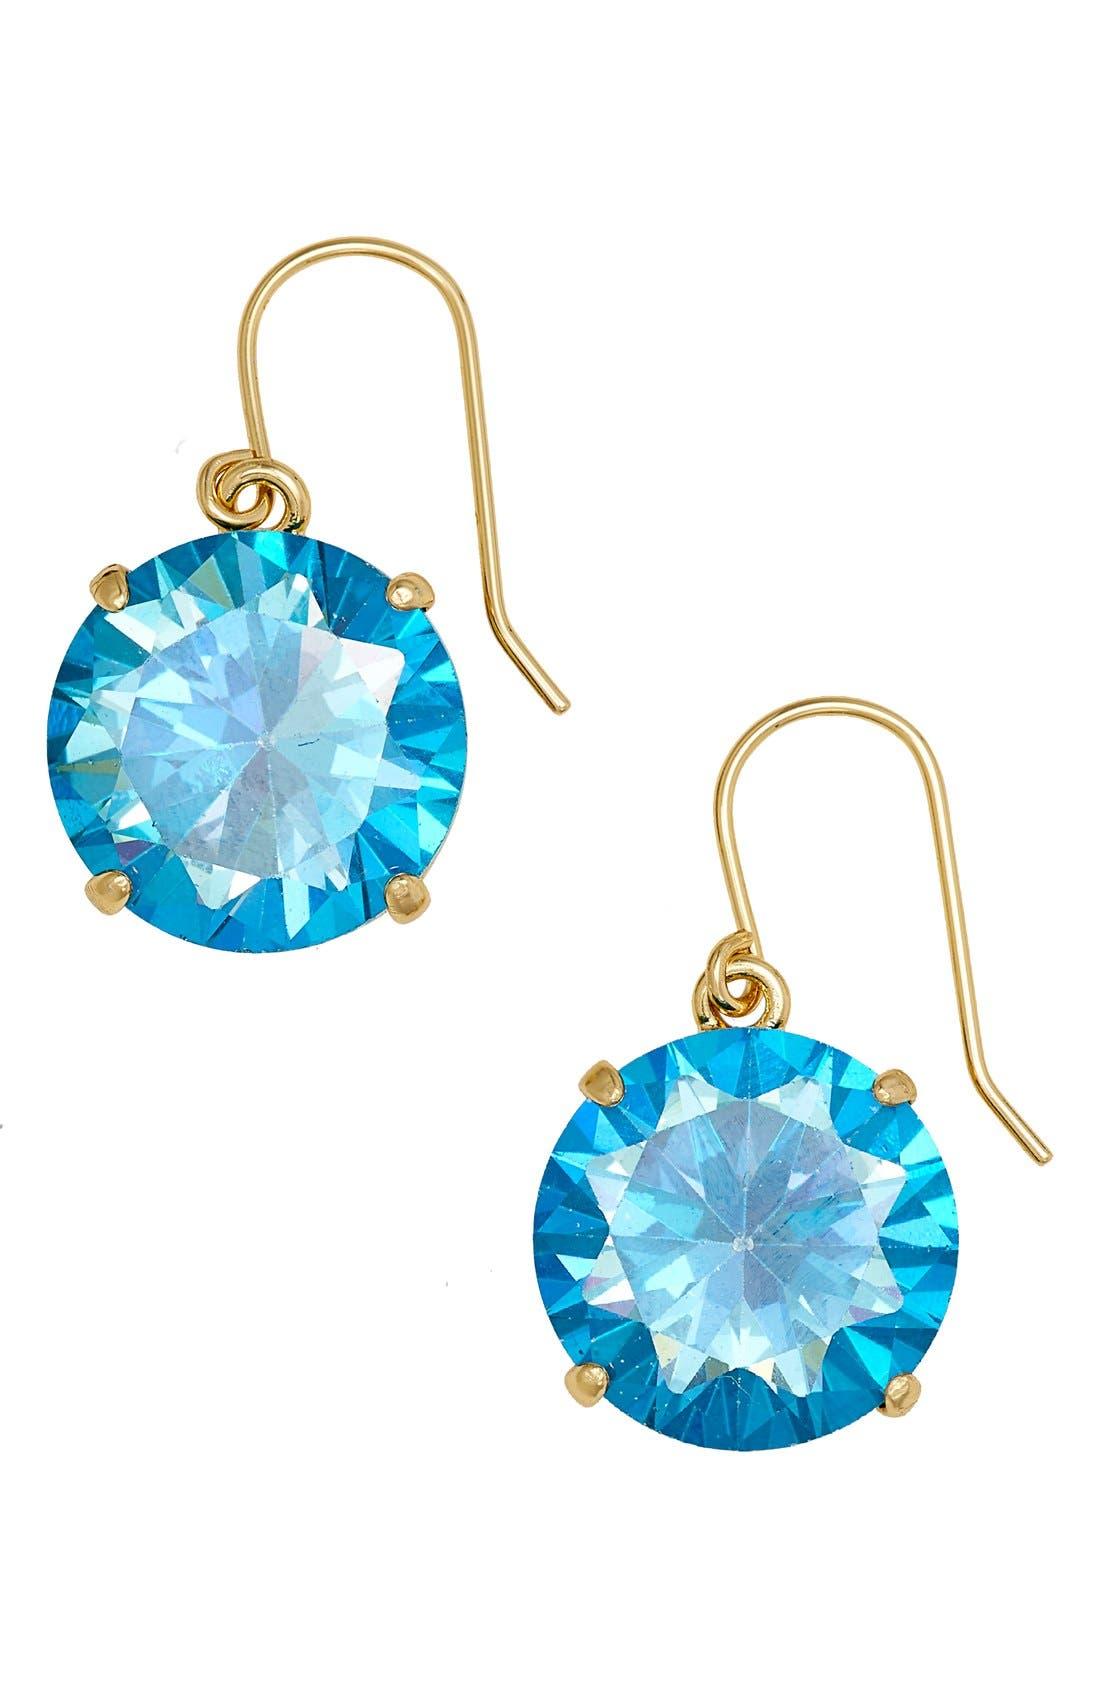 kate spade new york 'shine on' drop earrings